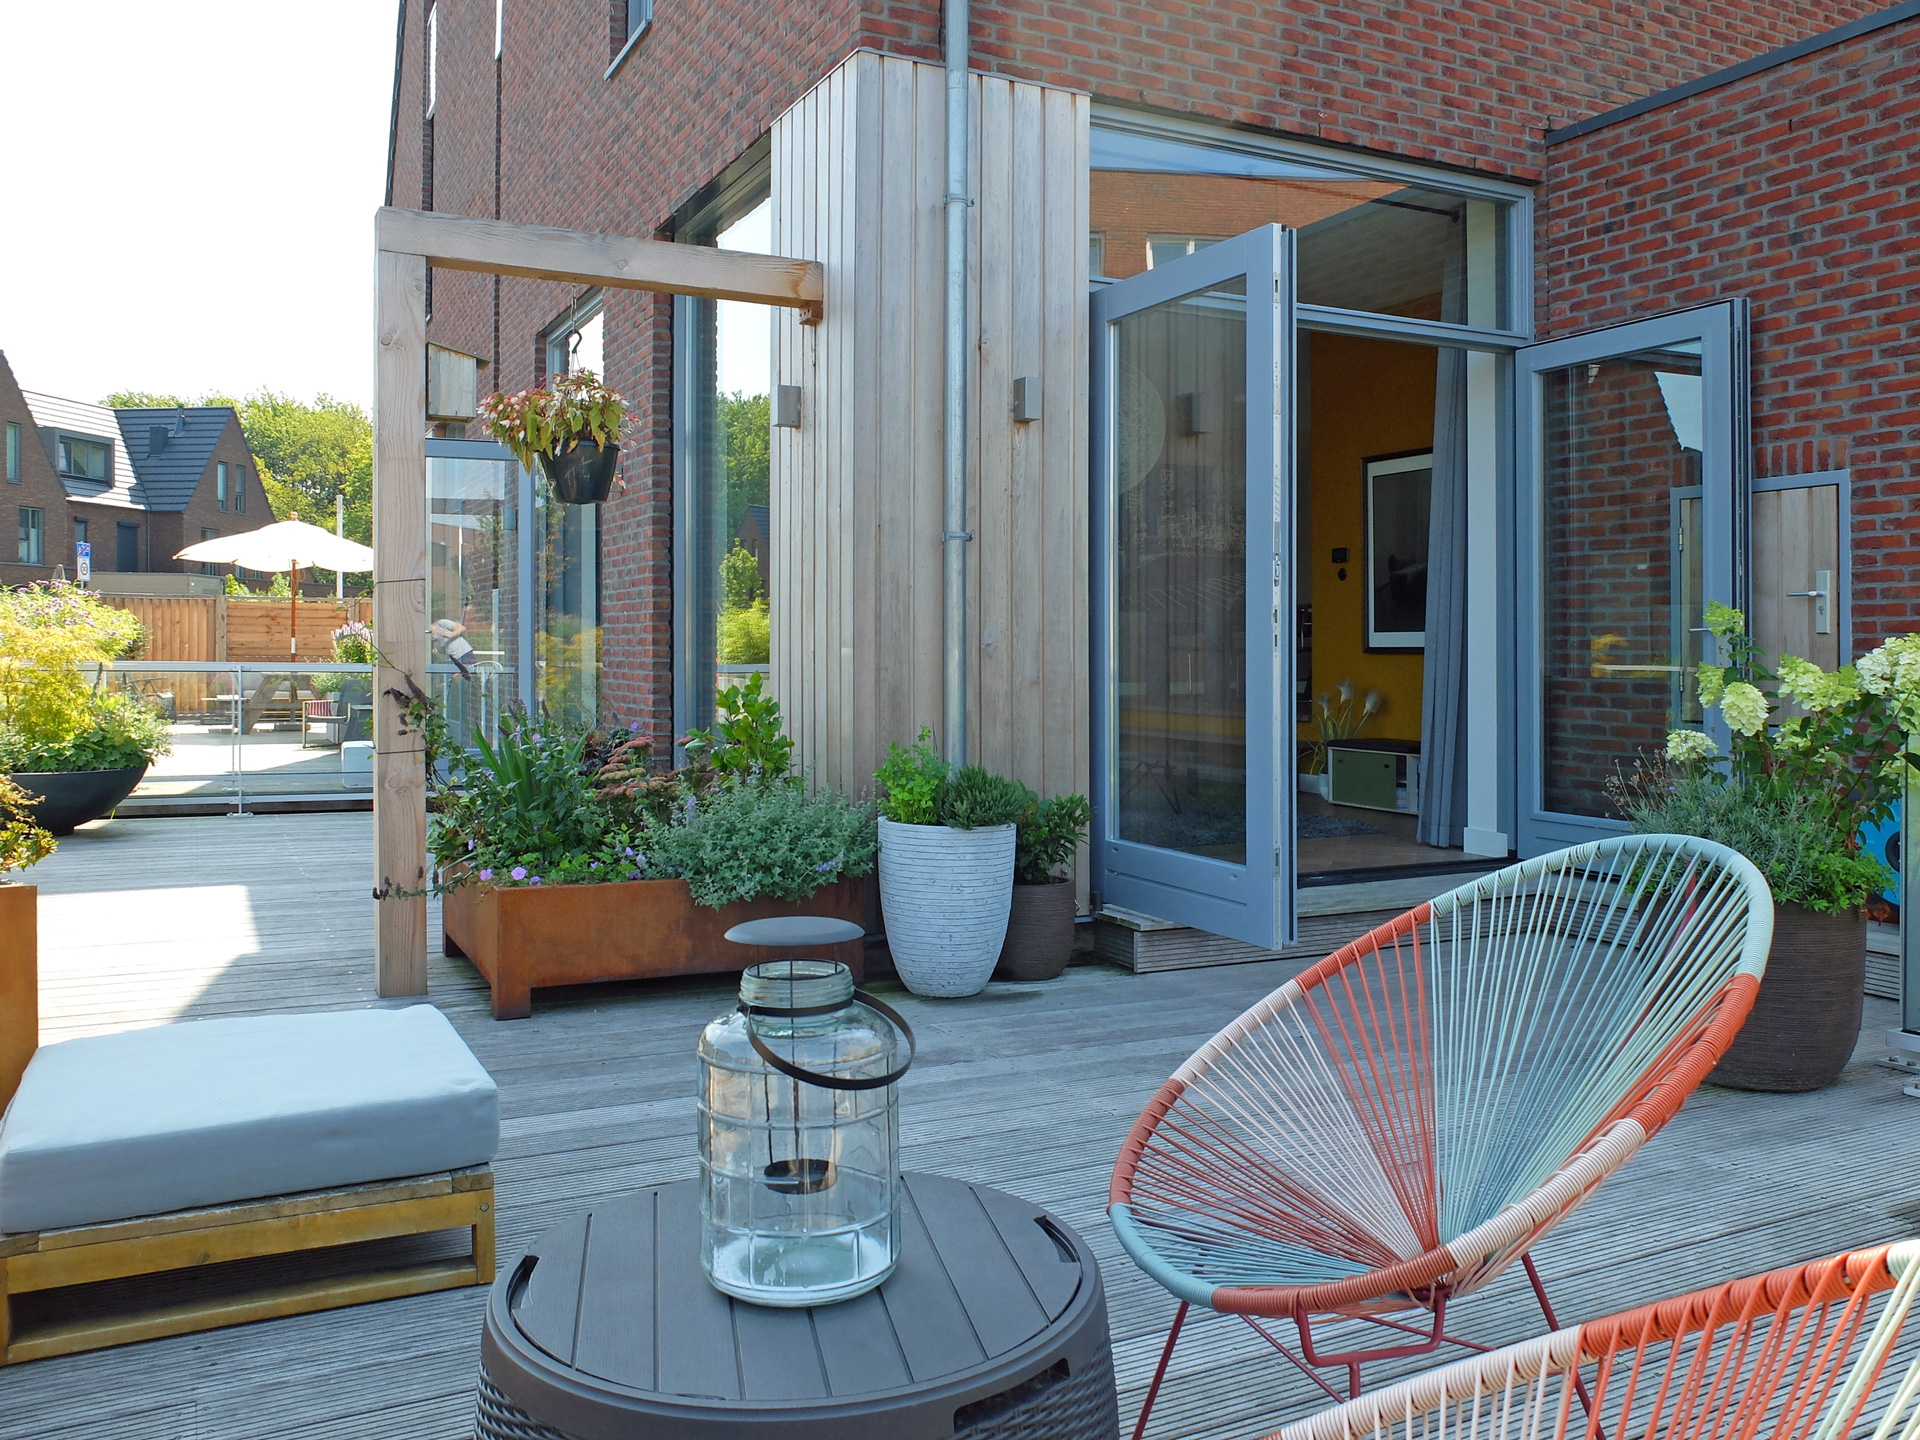 LAGADO-architects-orange-core-living-room-level-felt-residential-interior-at-home-terrace